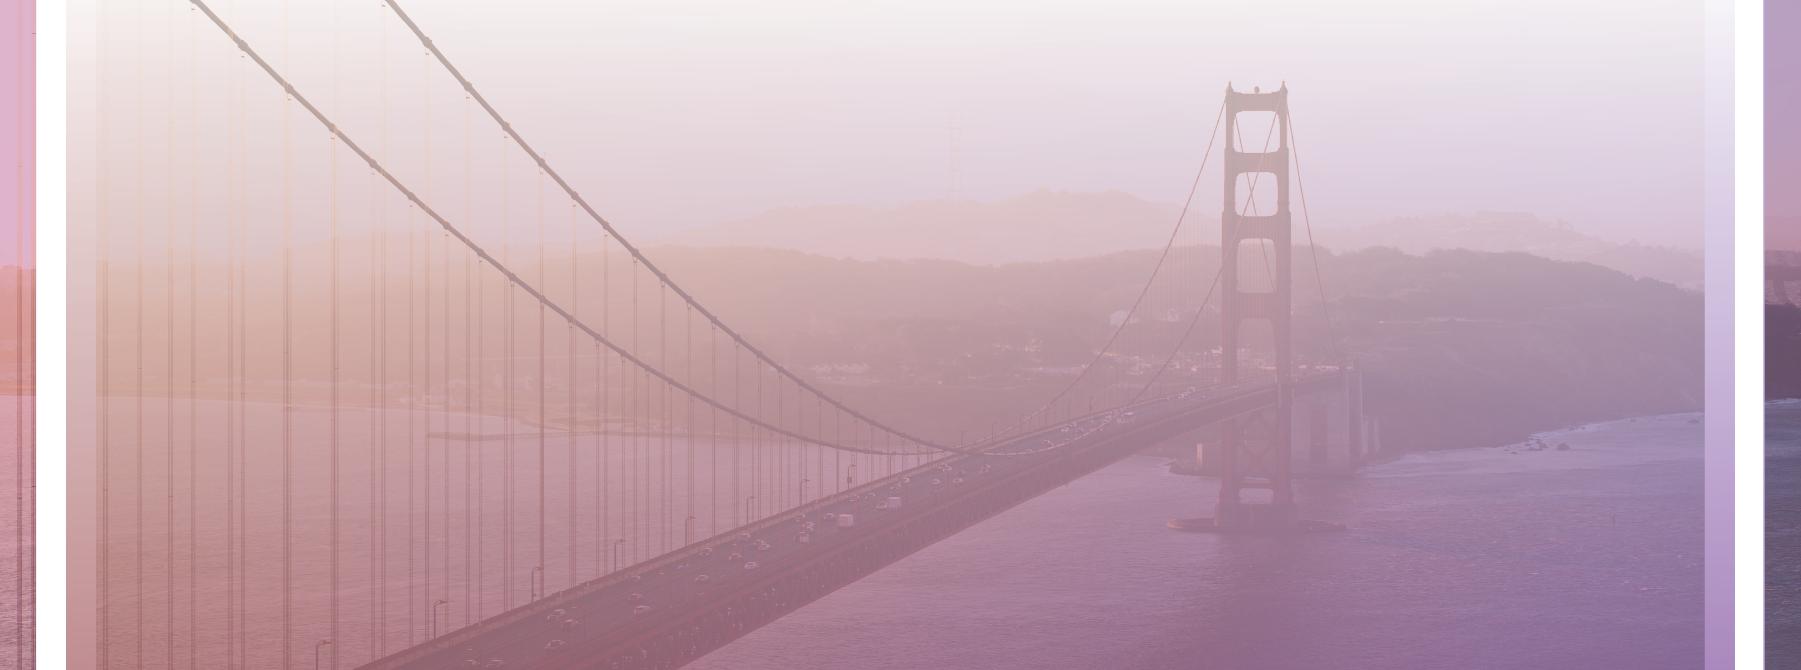 EvenVision Blog Post - San Francisco Example